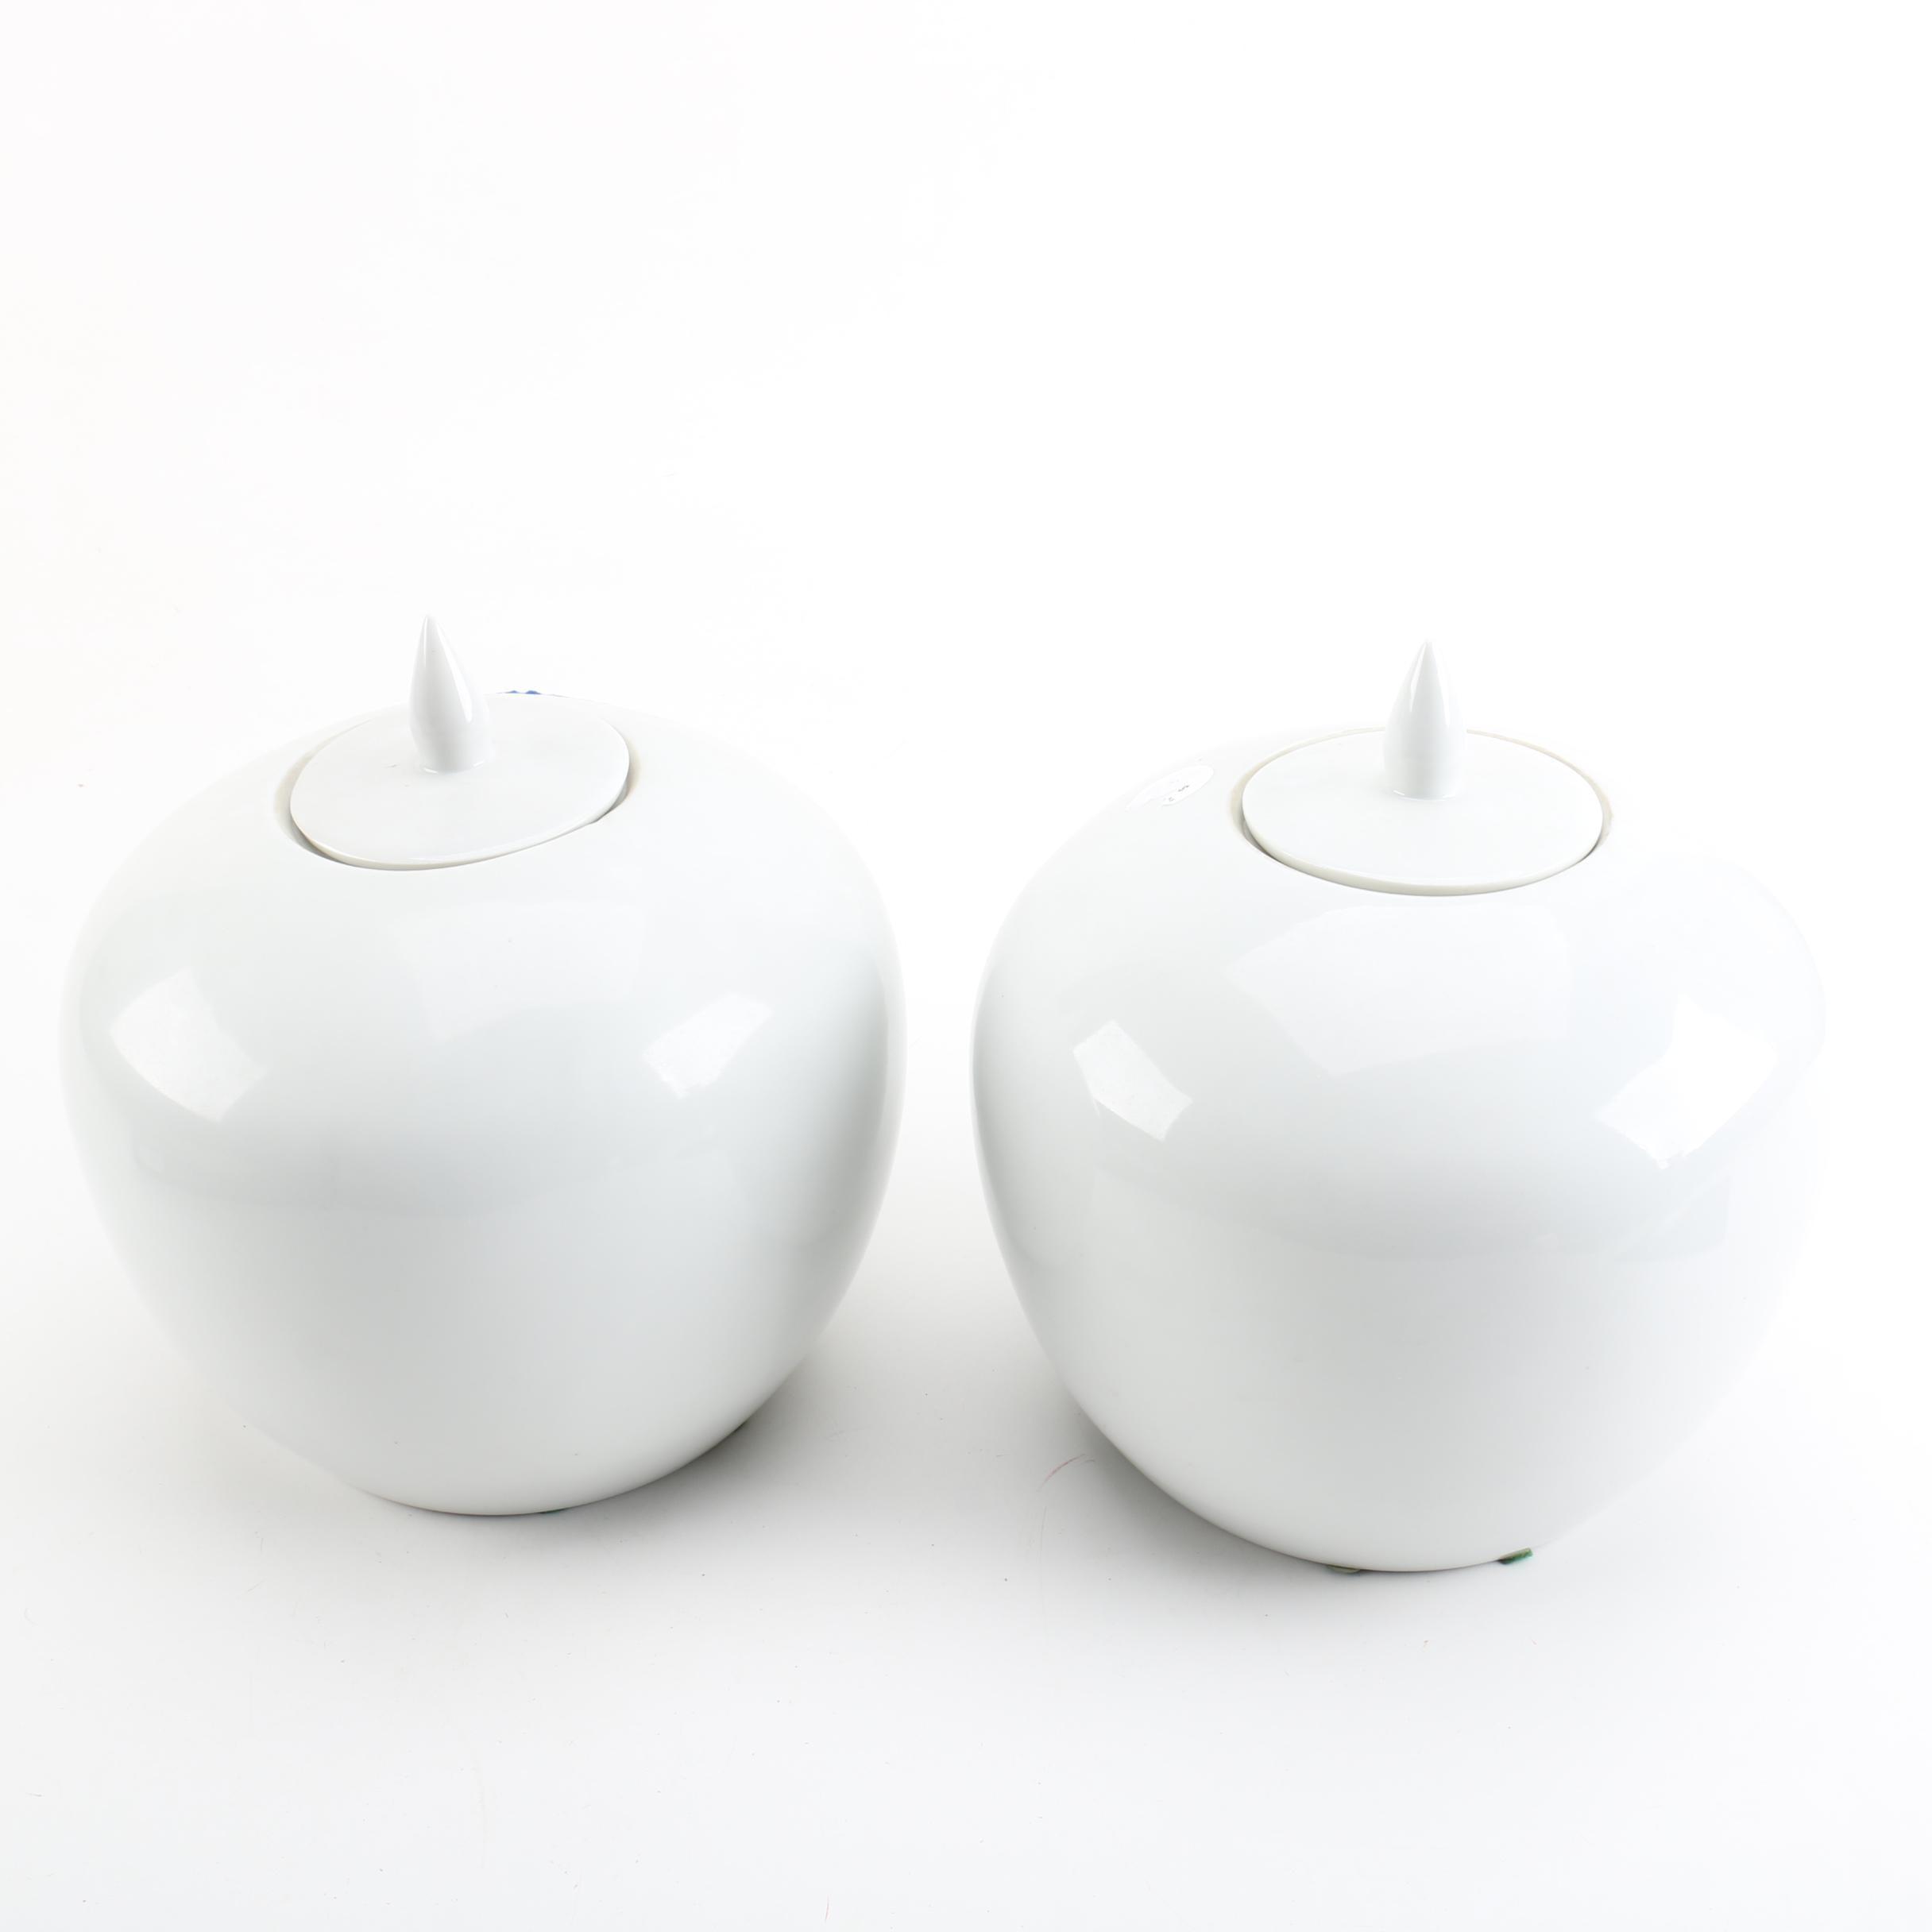 Ceramic Jars by Rubel & Co.